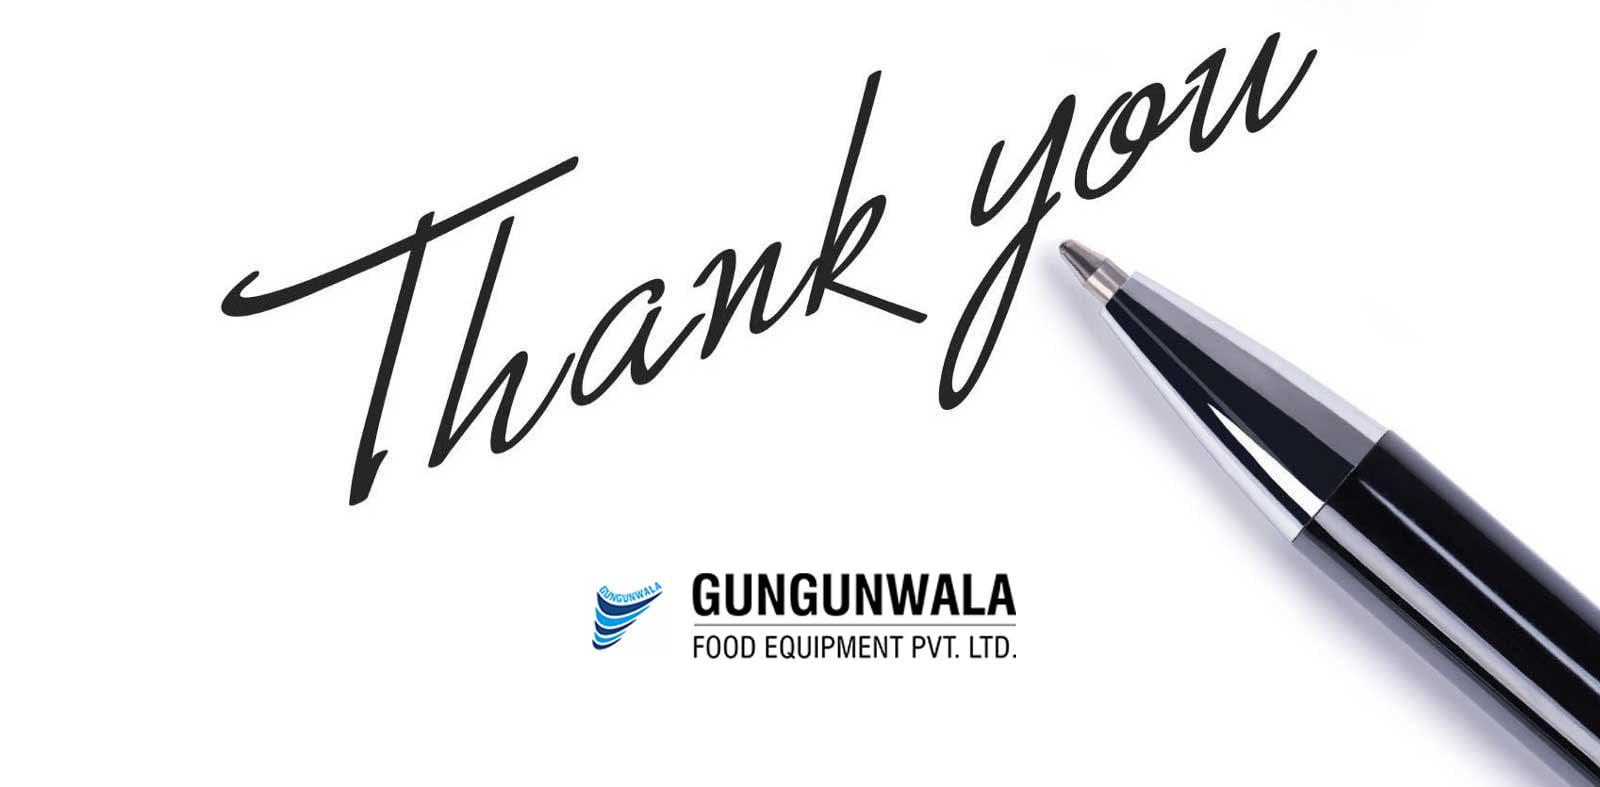 Thank You - Gungunwala Food Processing Equipment